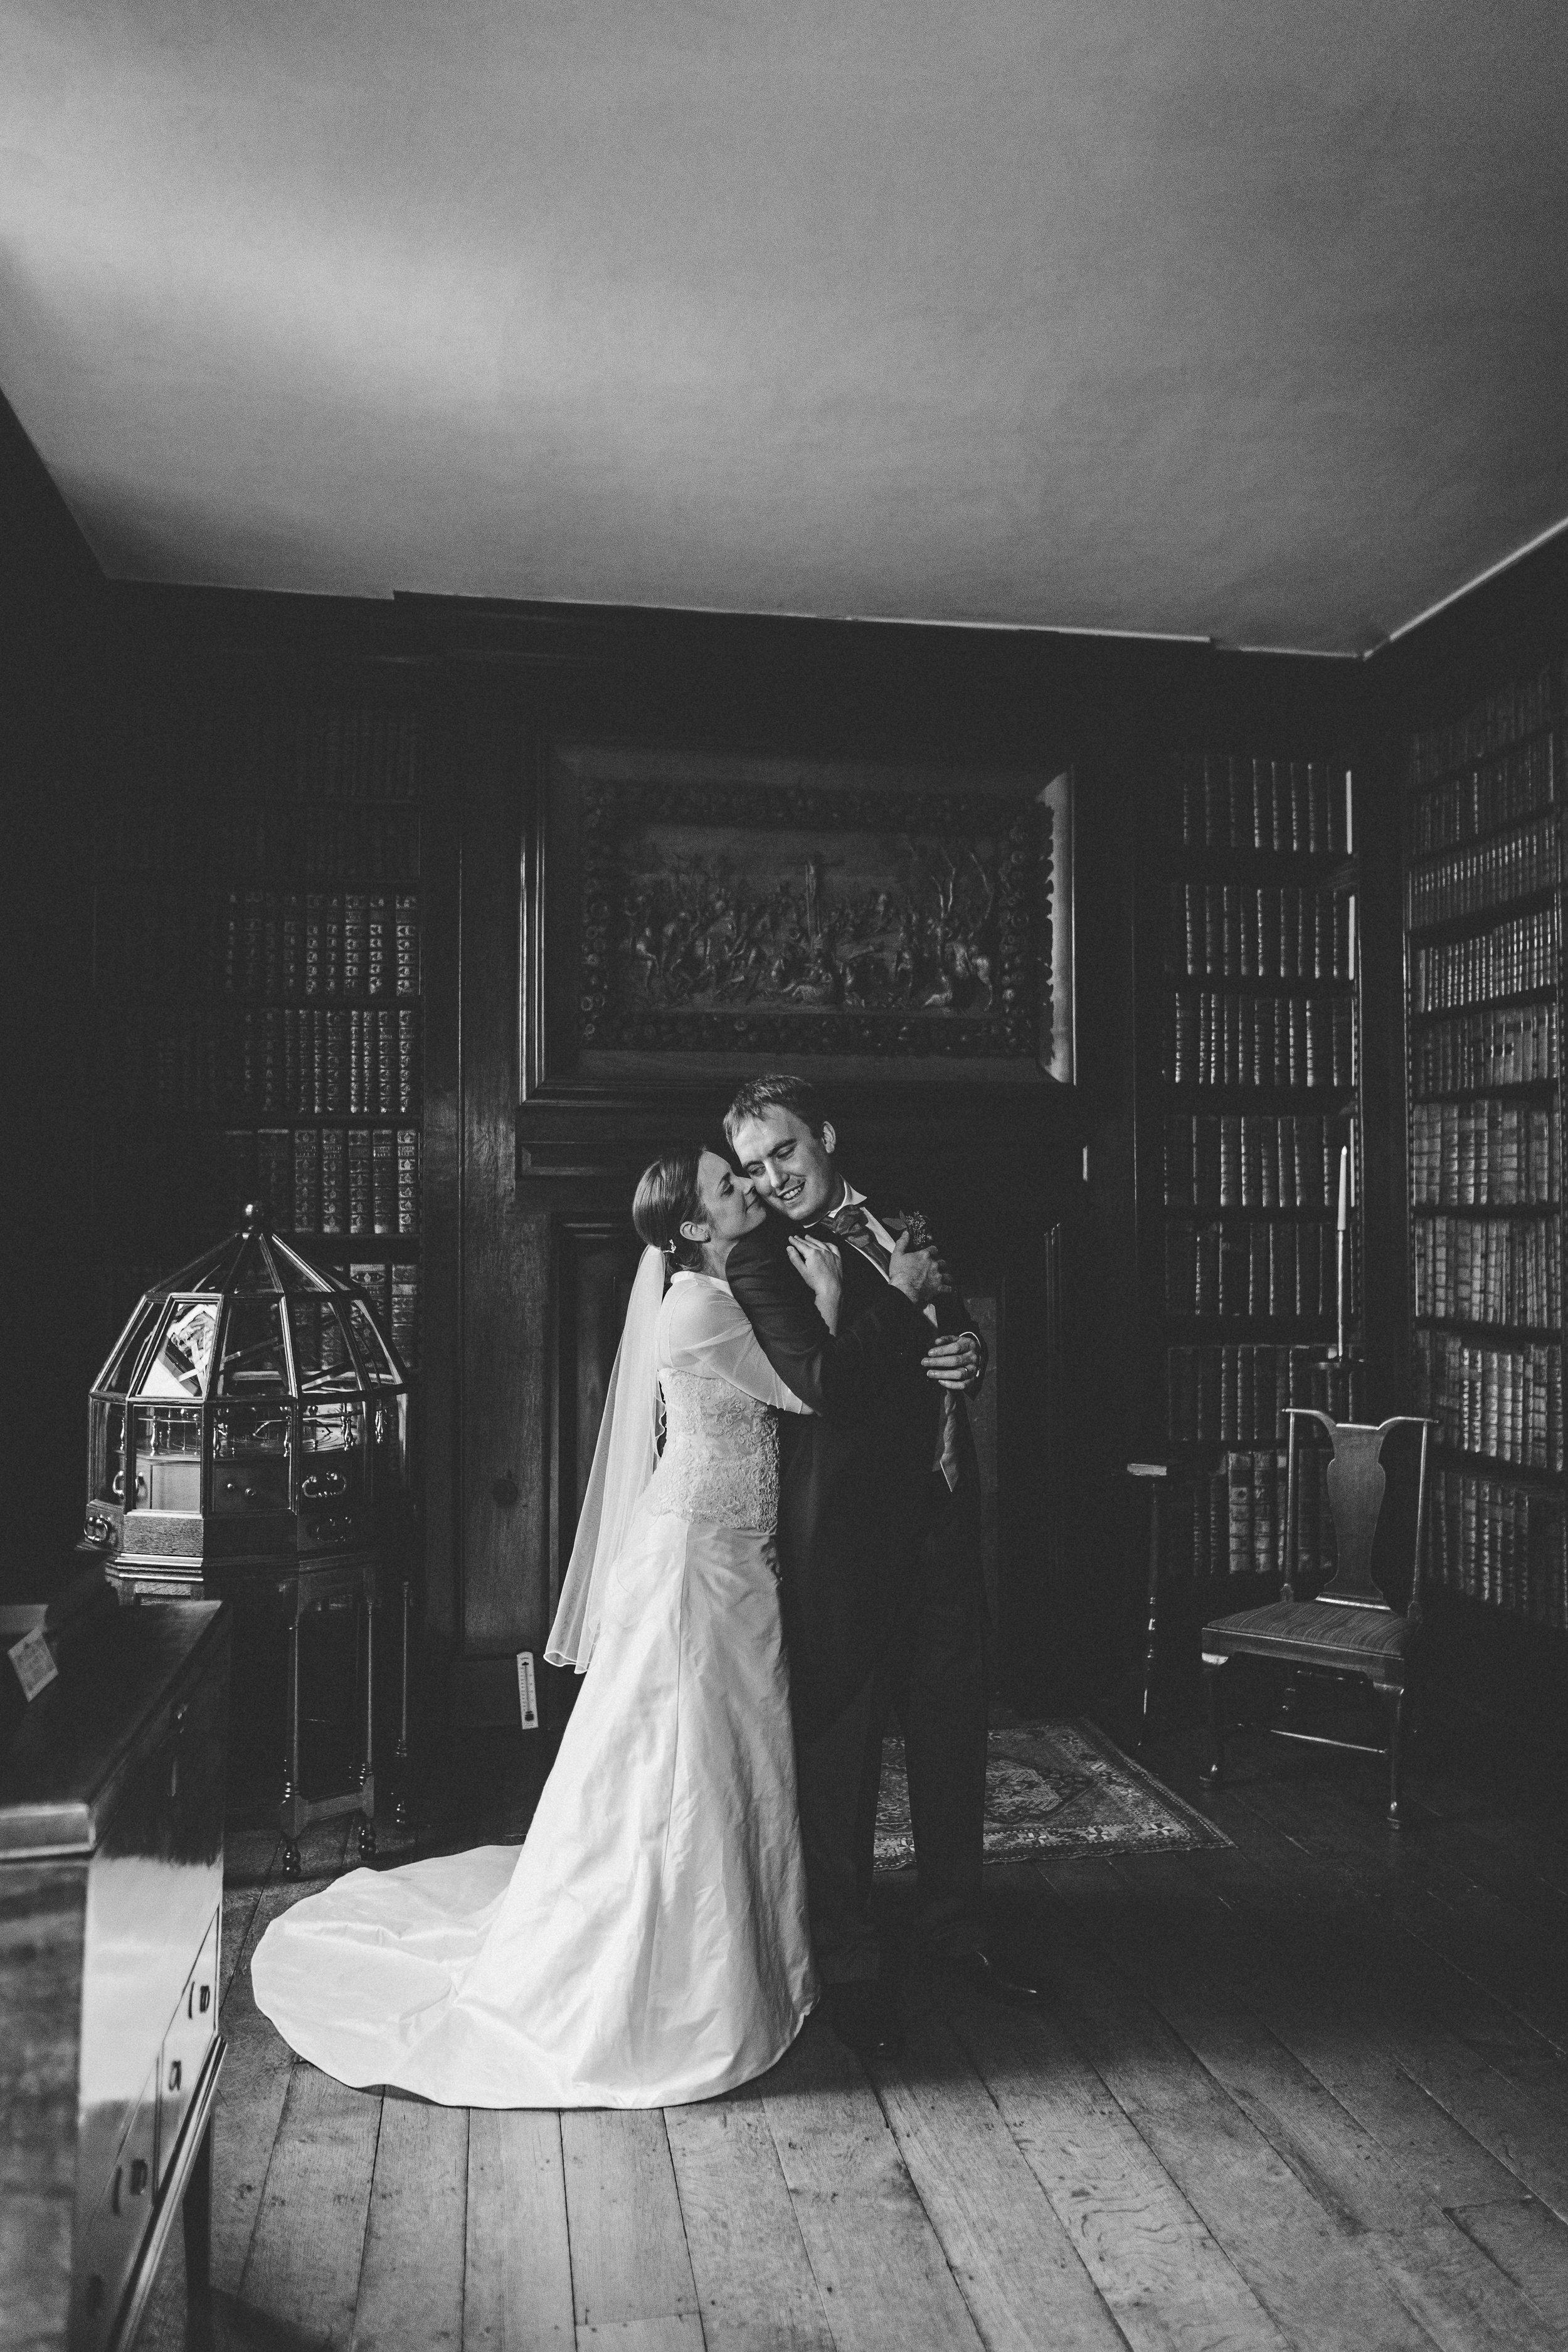 Dunham-Massey-Wedding-Photographer-58.jpg